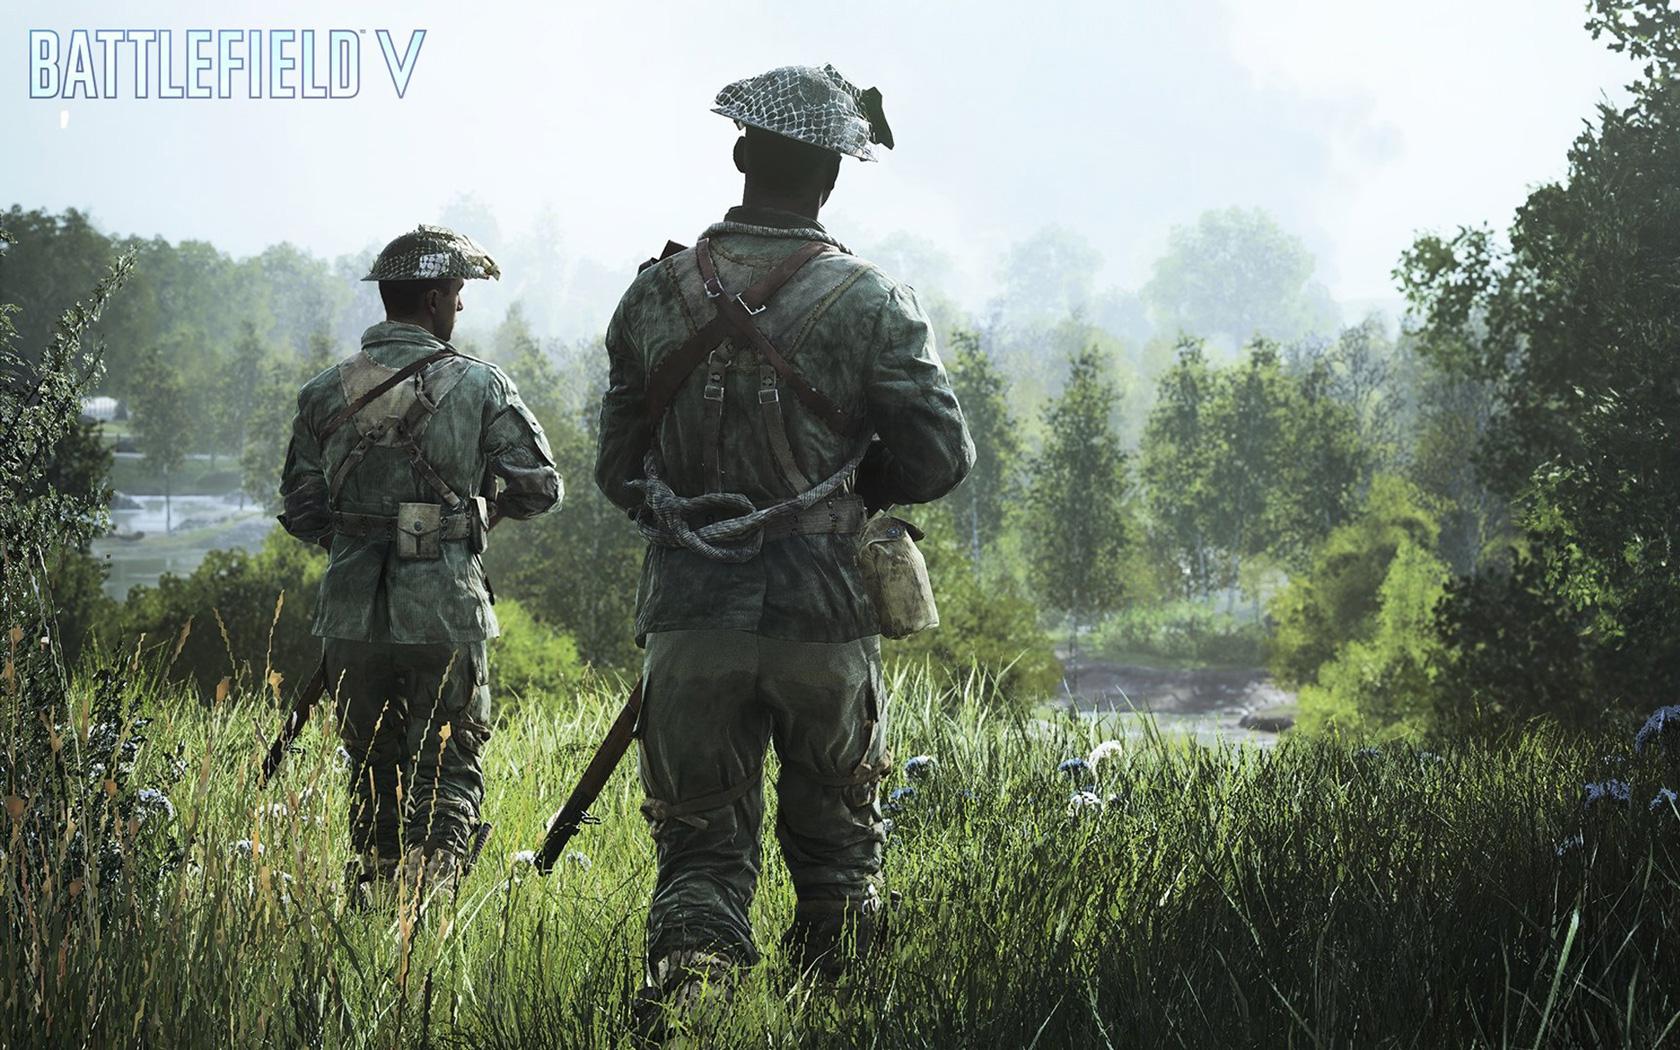 Free Battlefield V Wallpaper in 1680x1050